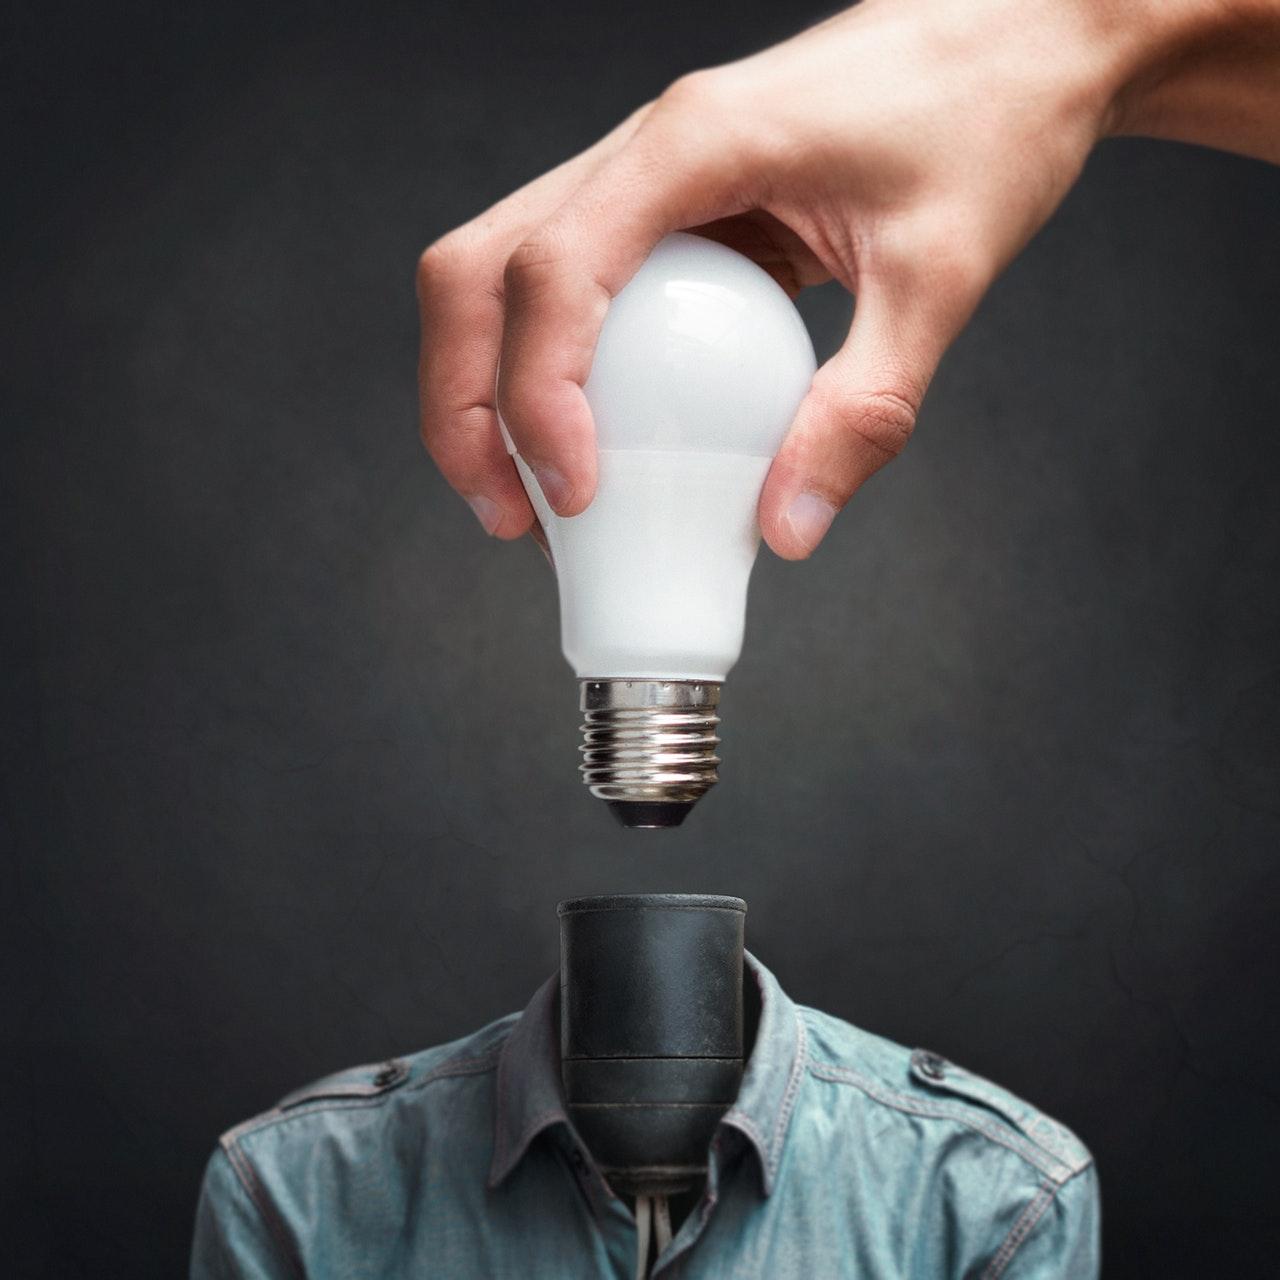 disonancia cognitiva creatividad inbound mindset